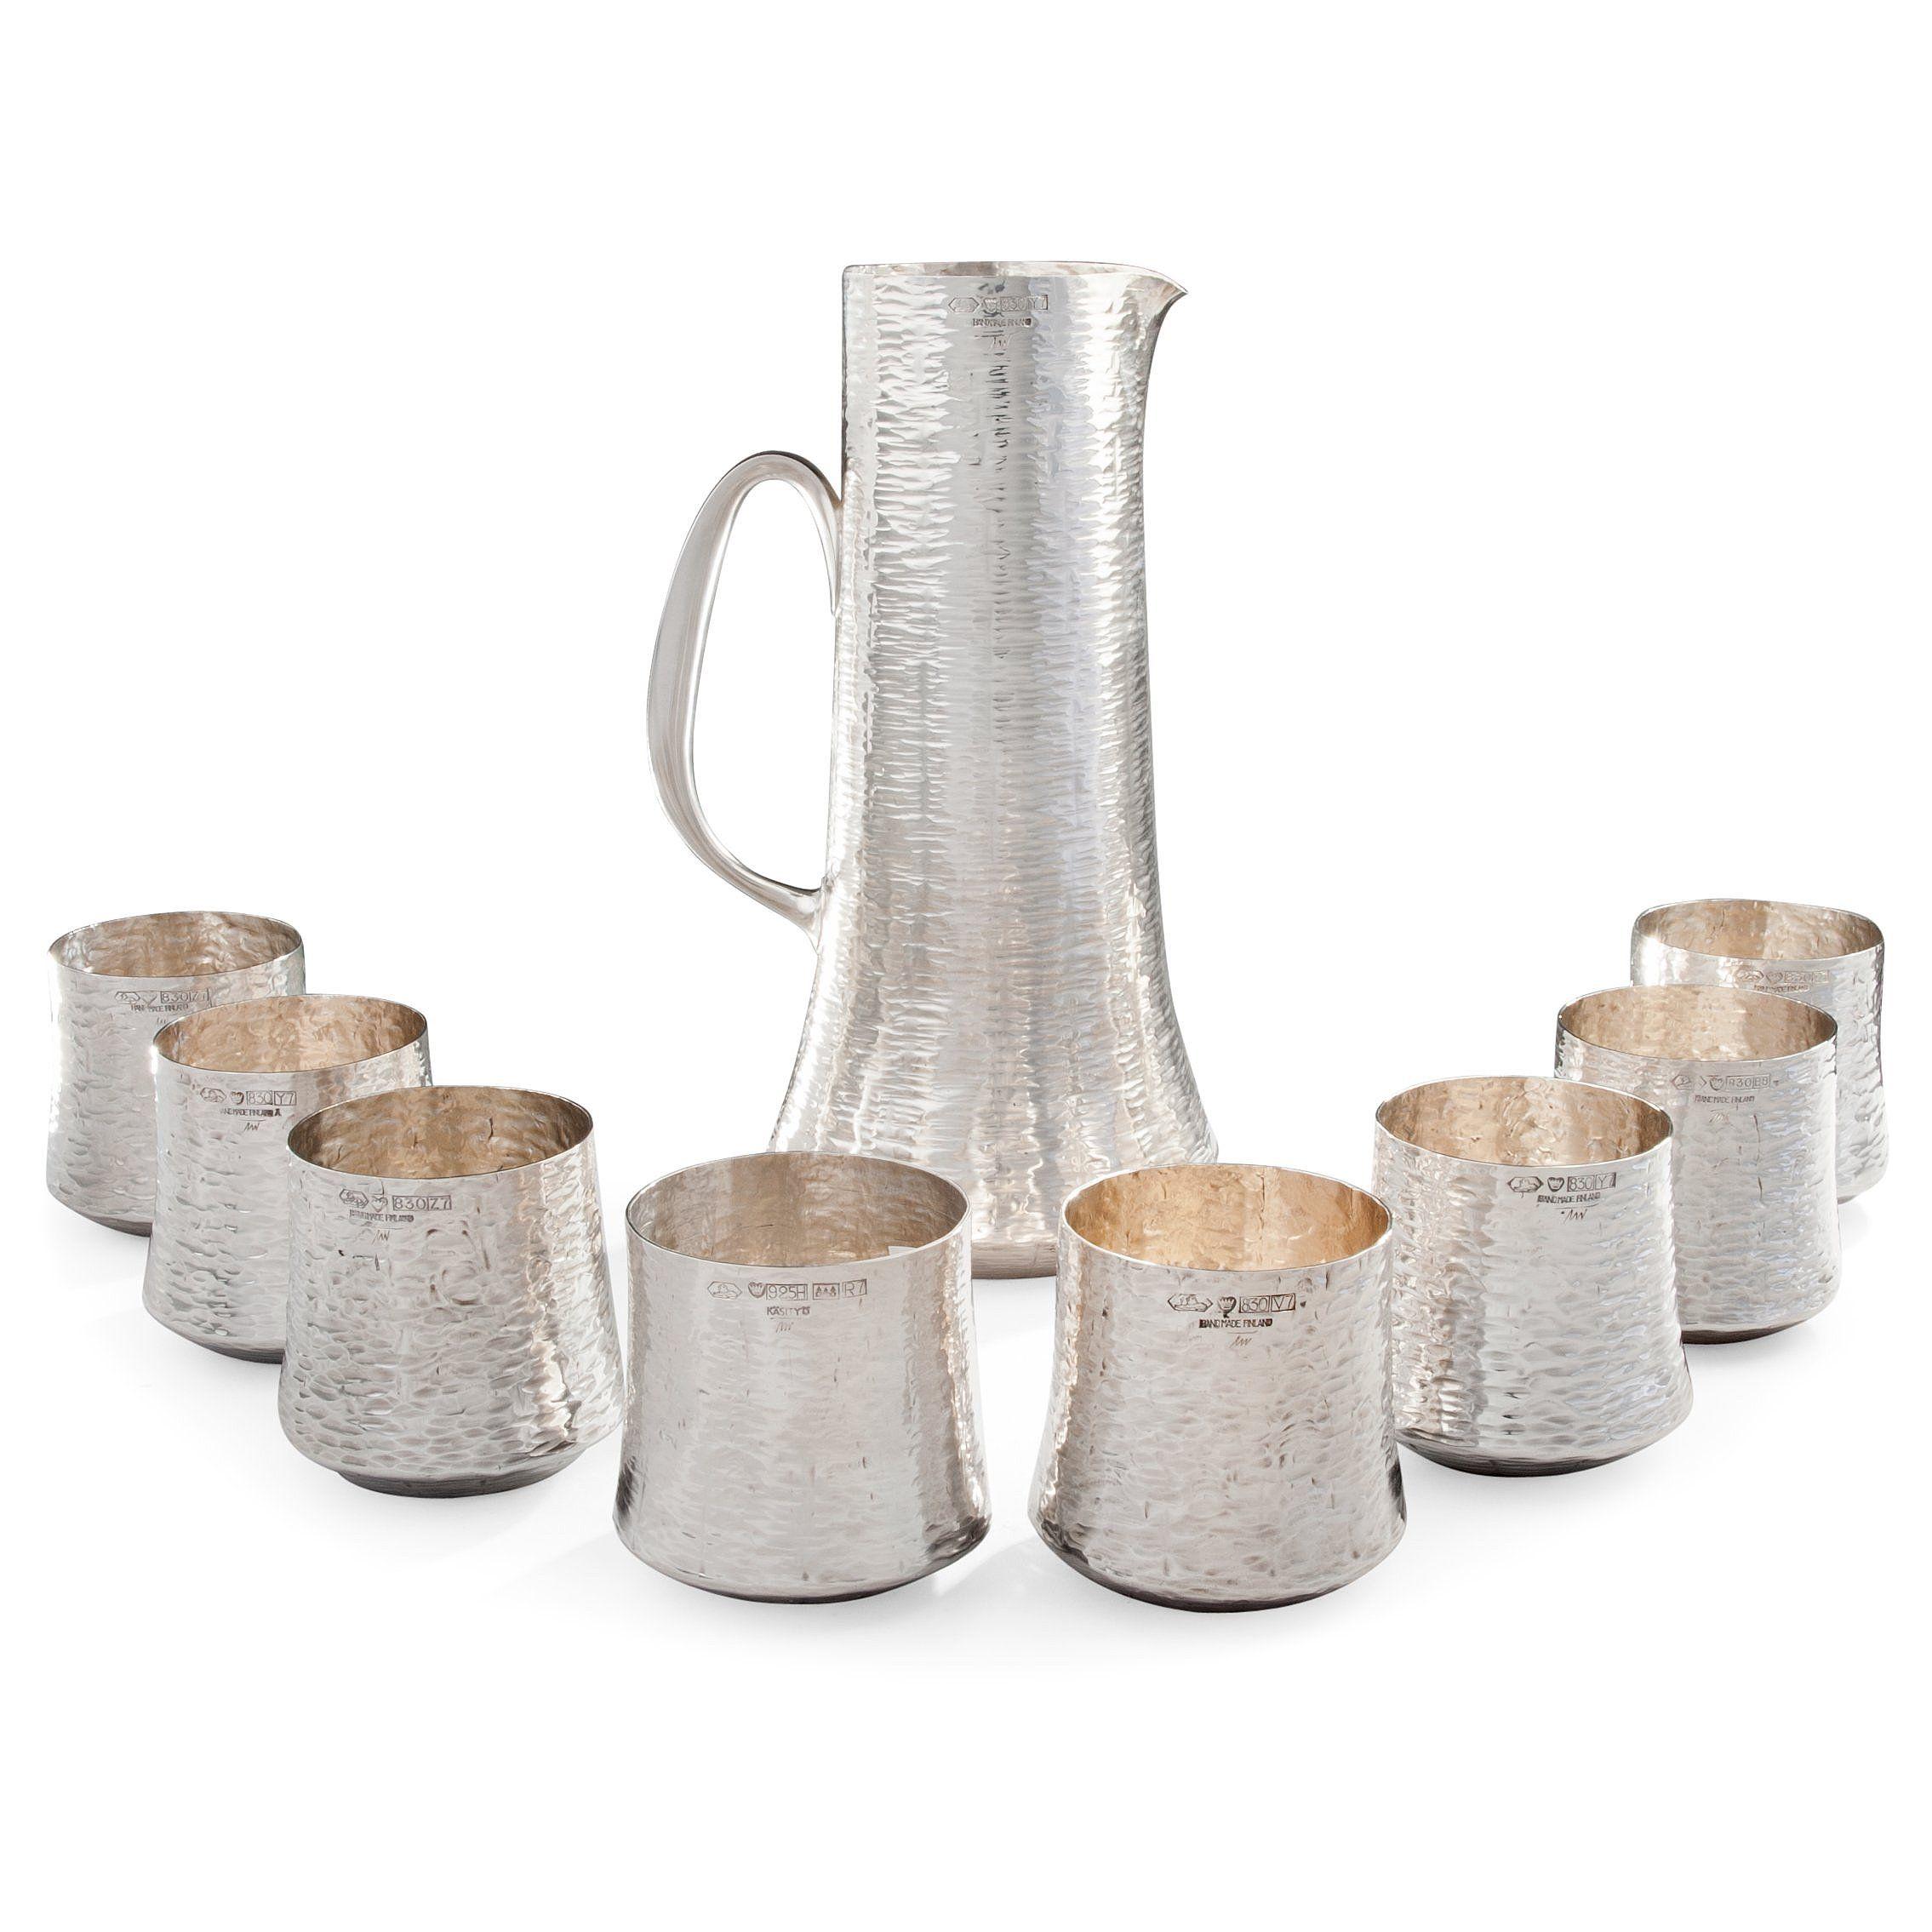 Tapio Wirkkala silver pitcher & beaker set. (Signed TW. Silver 830. Kultakeskus, Hämeenlinna, 1970s.)